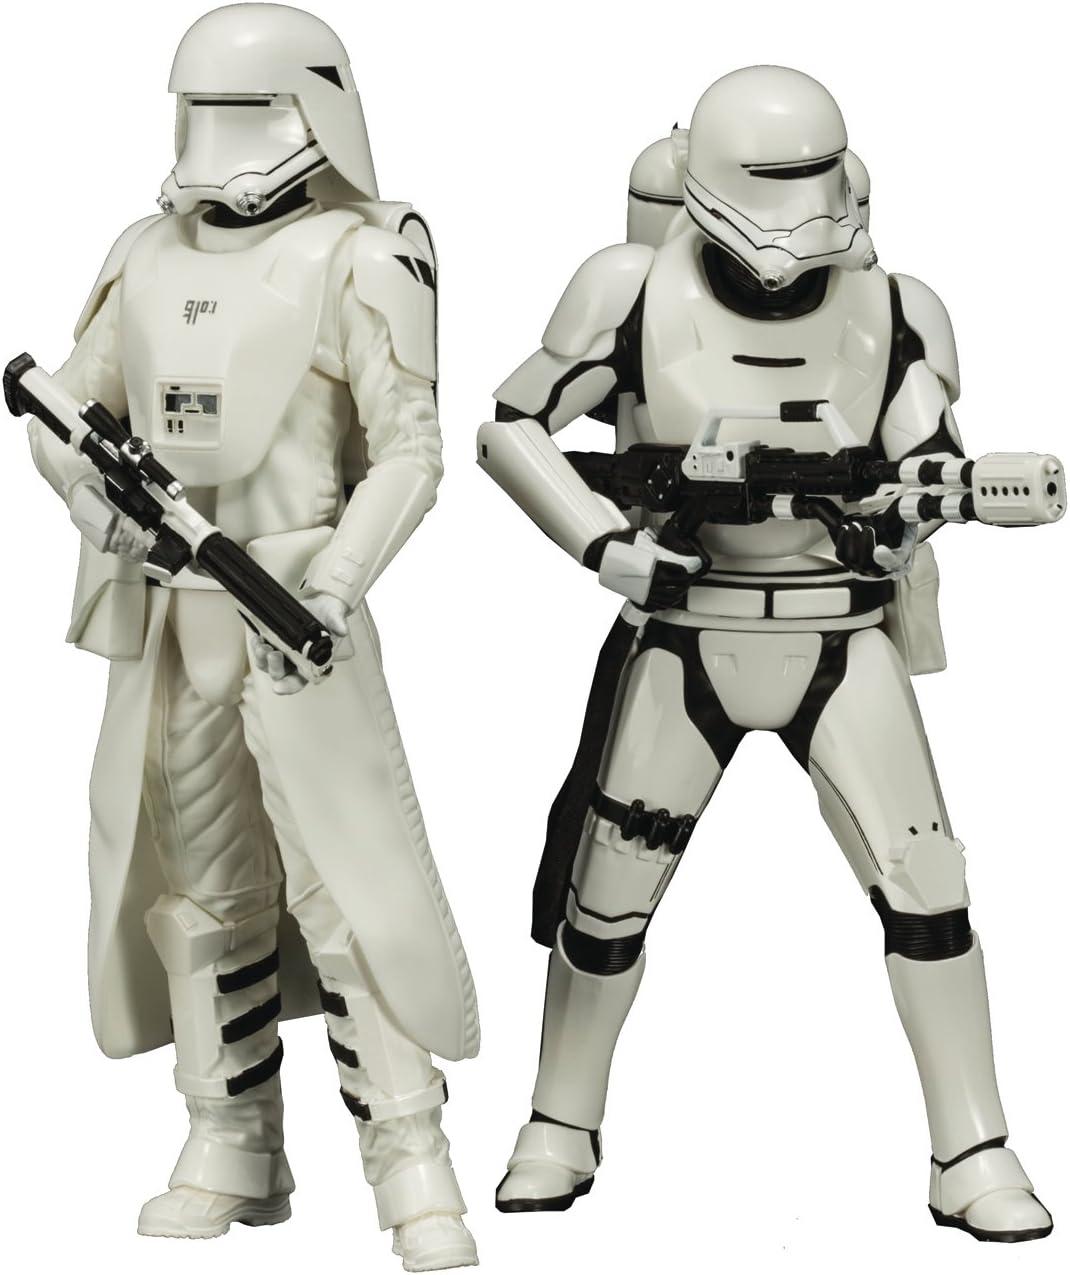 Kotobukiya Star Wars First Order Snowtrooper & Flametrooper (2 Pack)